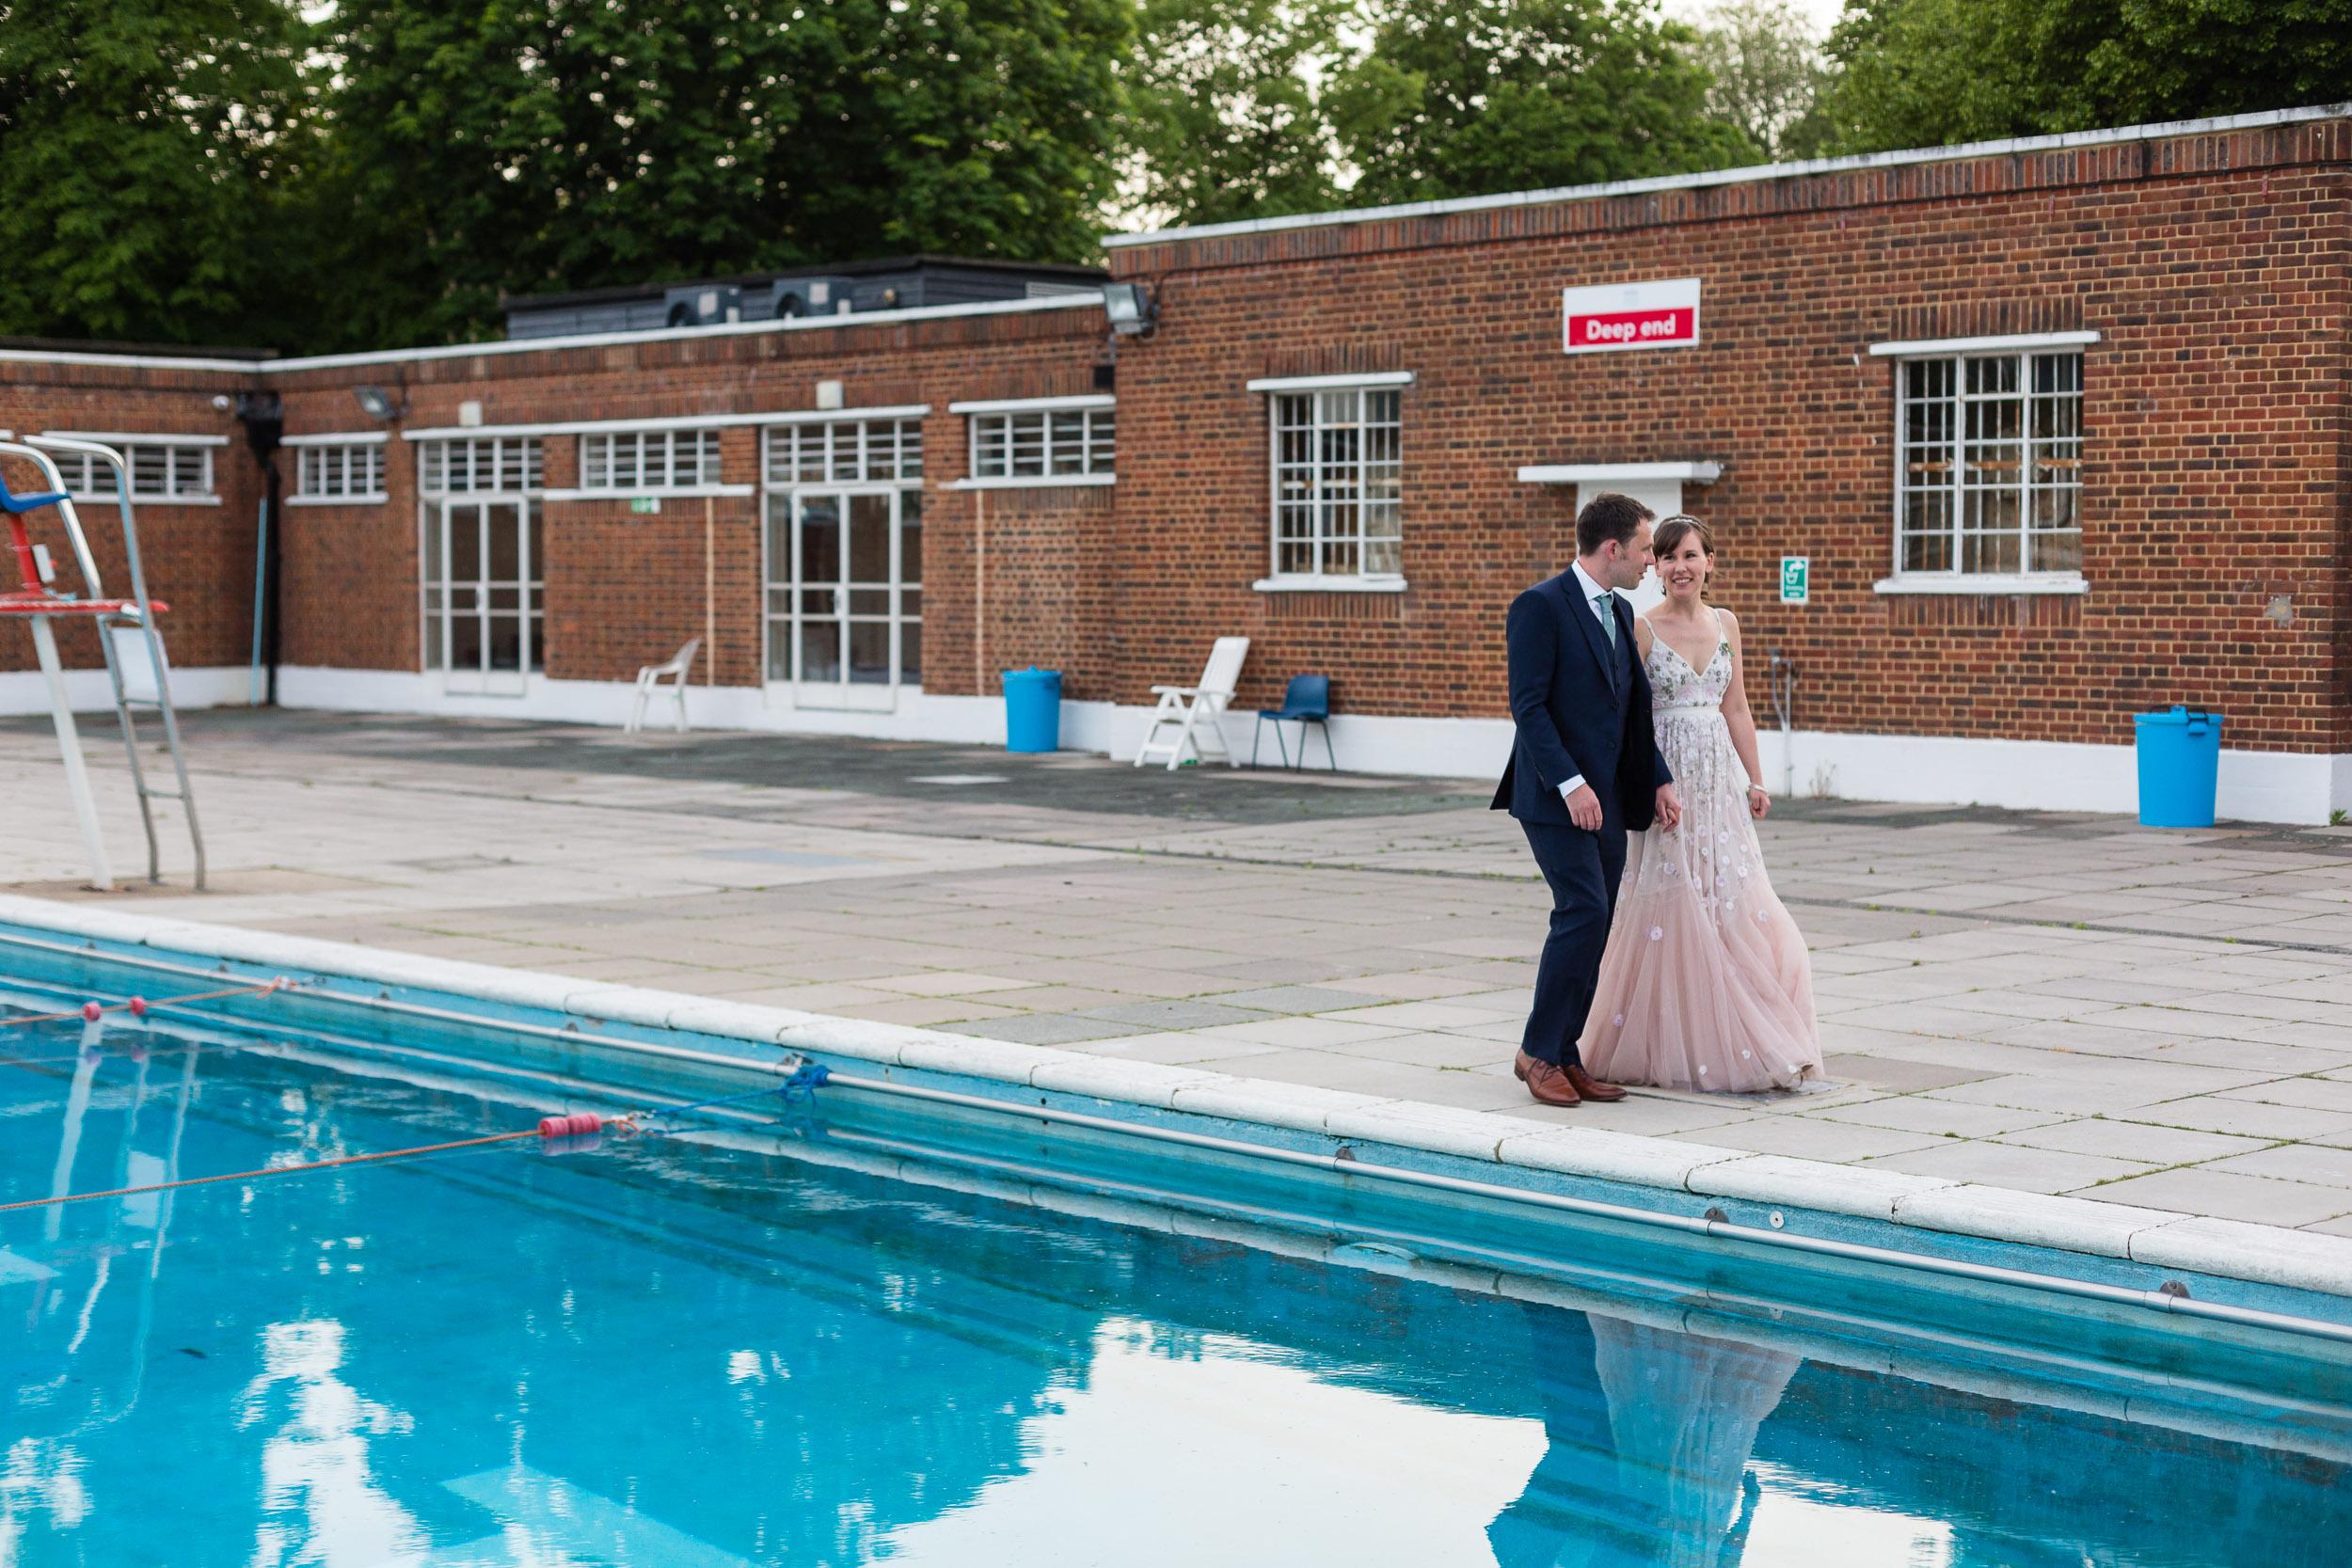 brockwell-lido-brixton-herne-hill-wedding-381.jpg